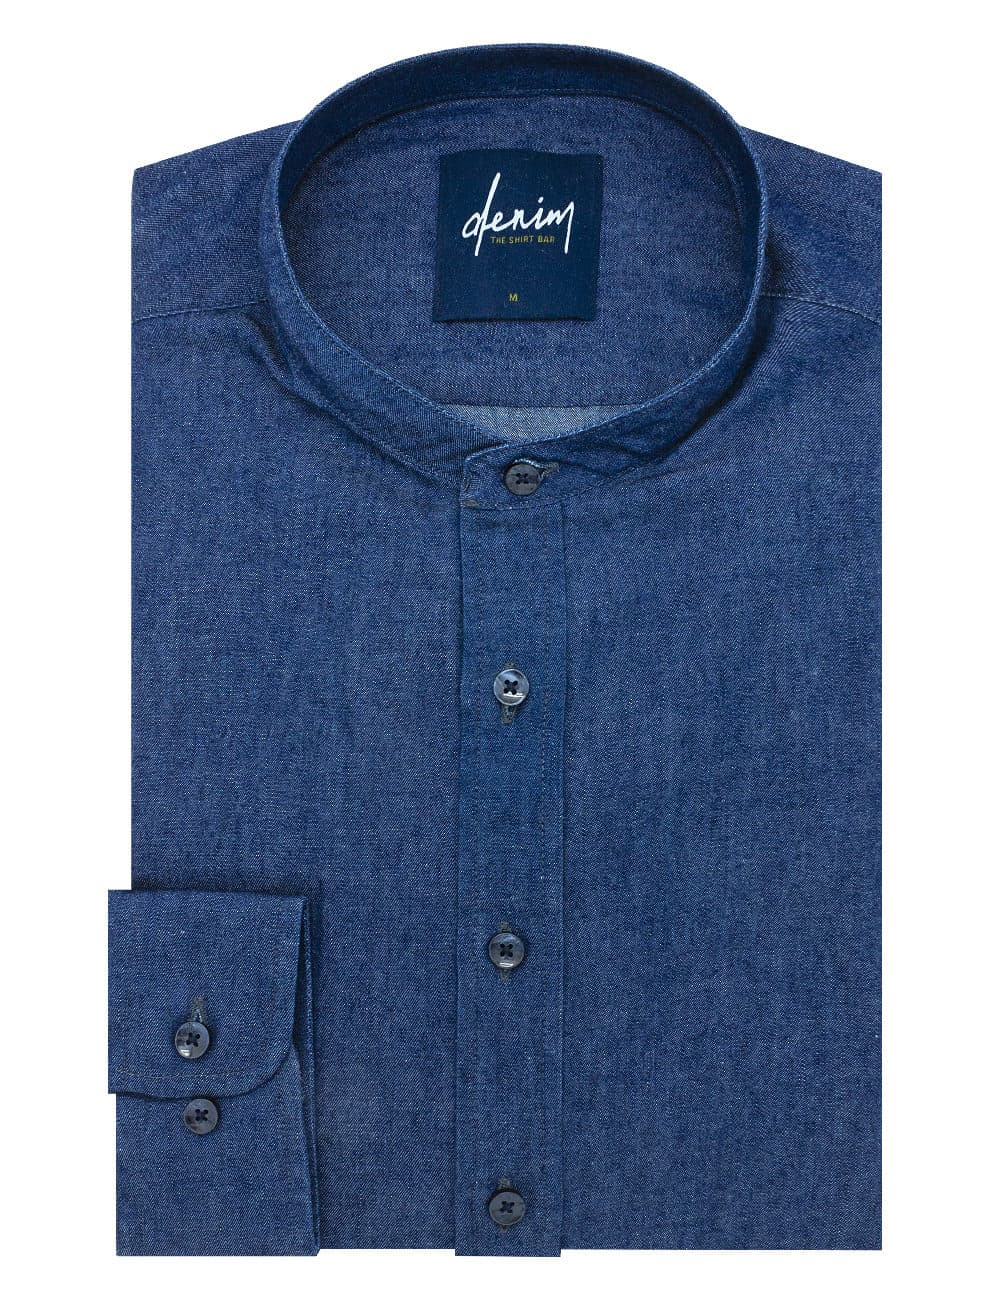 RF Blue Denim Mandarin Collar 100% Cotton Long Sleeve Single Cuff Shirt RF11B1.7